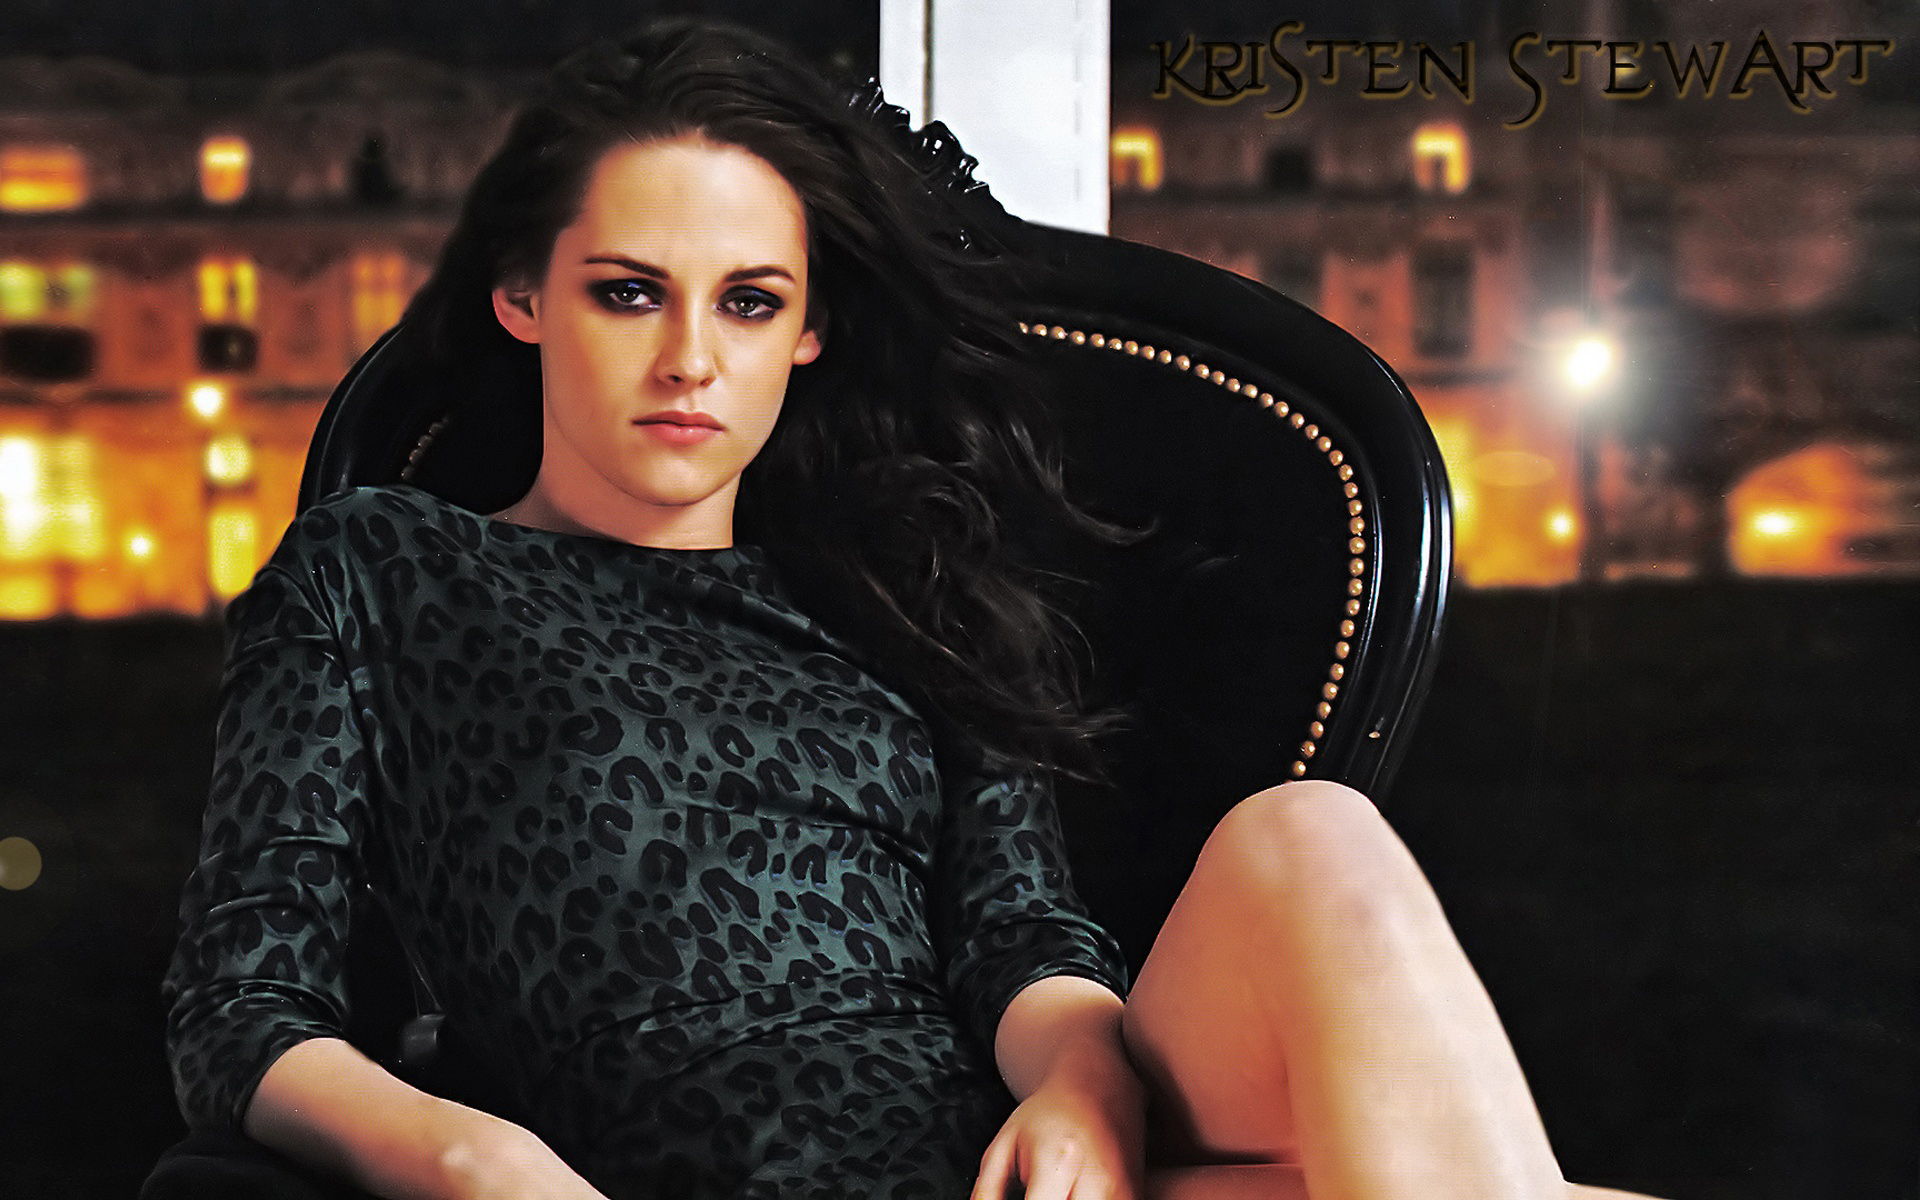 Kristen Stewart 35 wallpaper